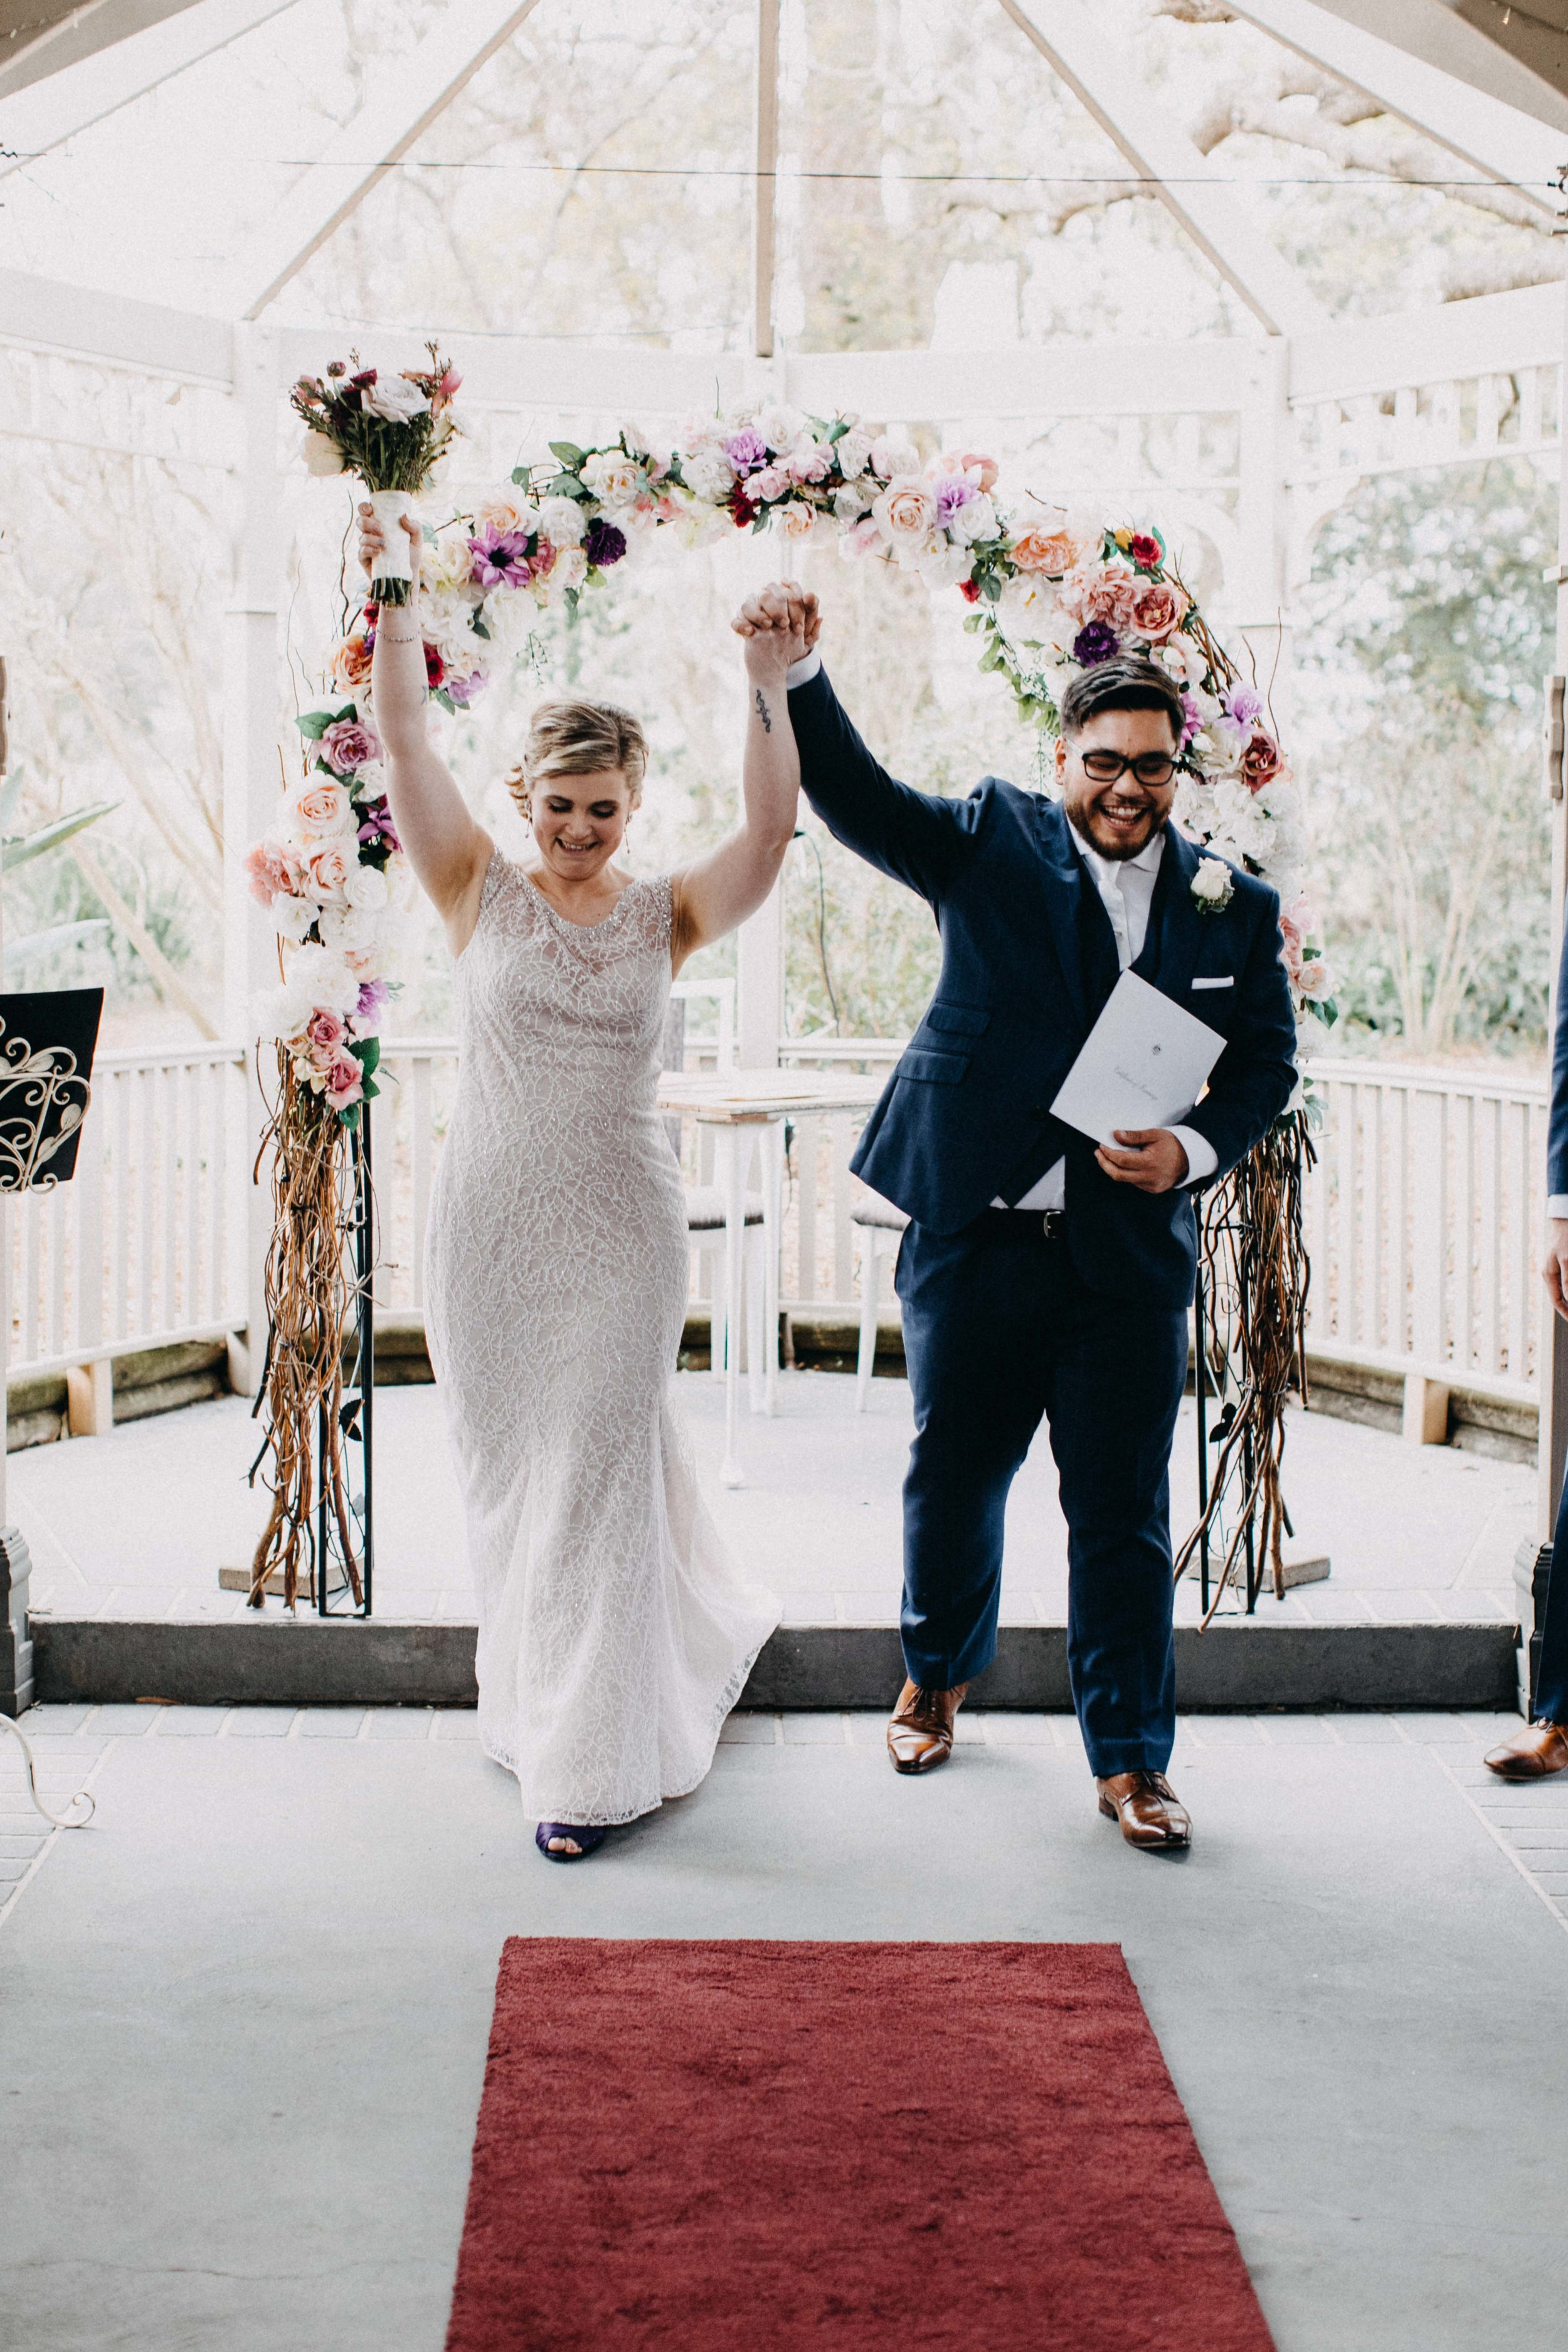 appin-house-wedding-macarthur-www.emilyobrienphotography.net-93.jpg